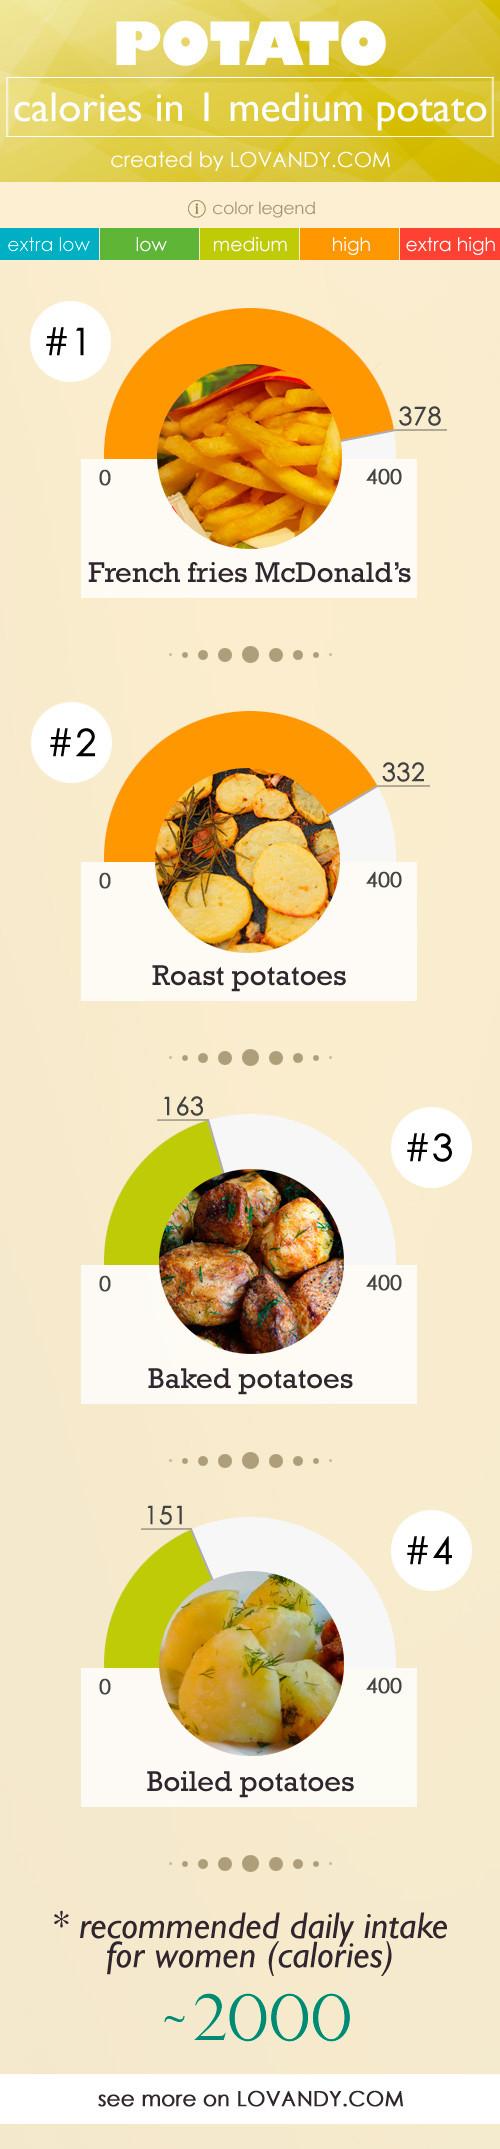 Calories In Small Baked Potato  Potato Calories Baked Mashed Roast per 1 potato 100g